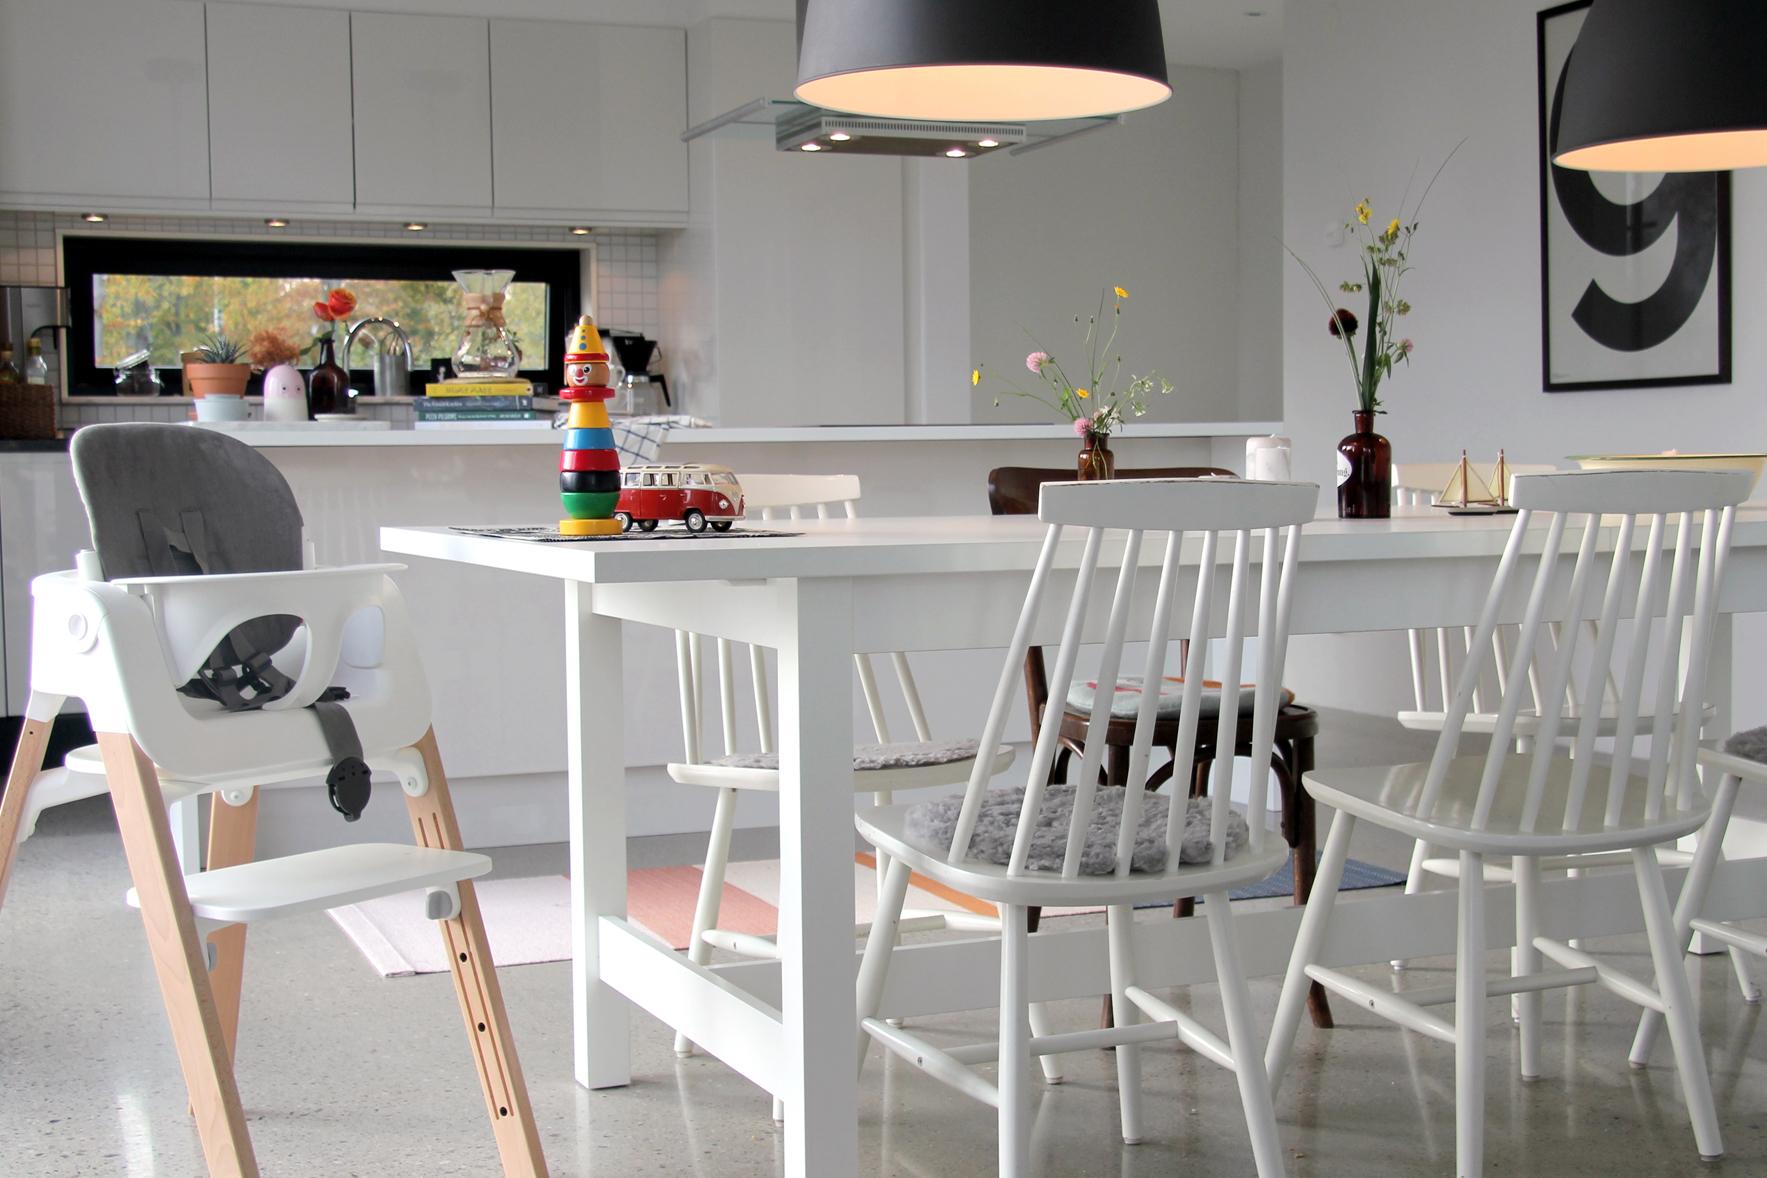 kitchen_small.jpg